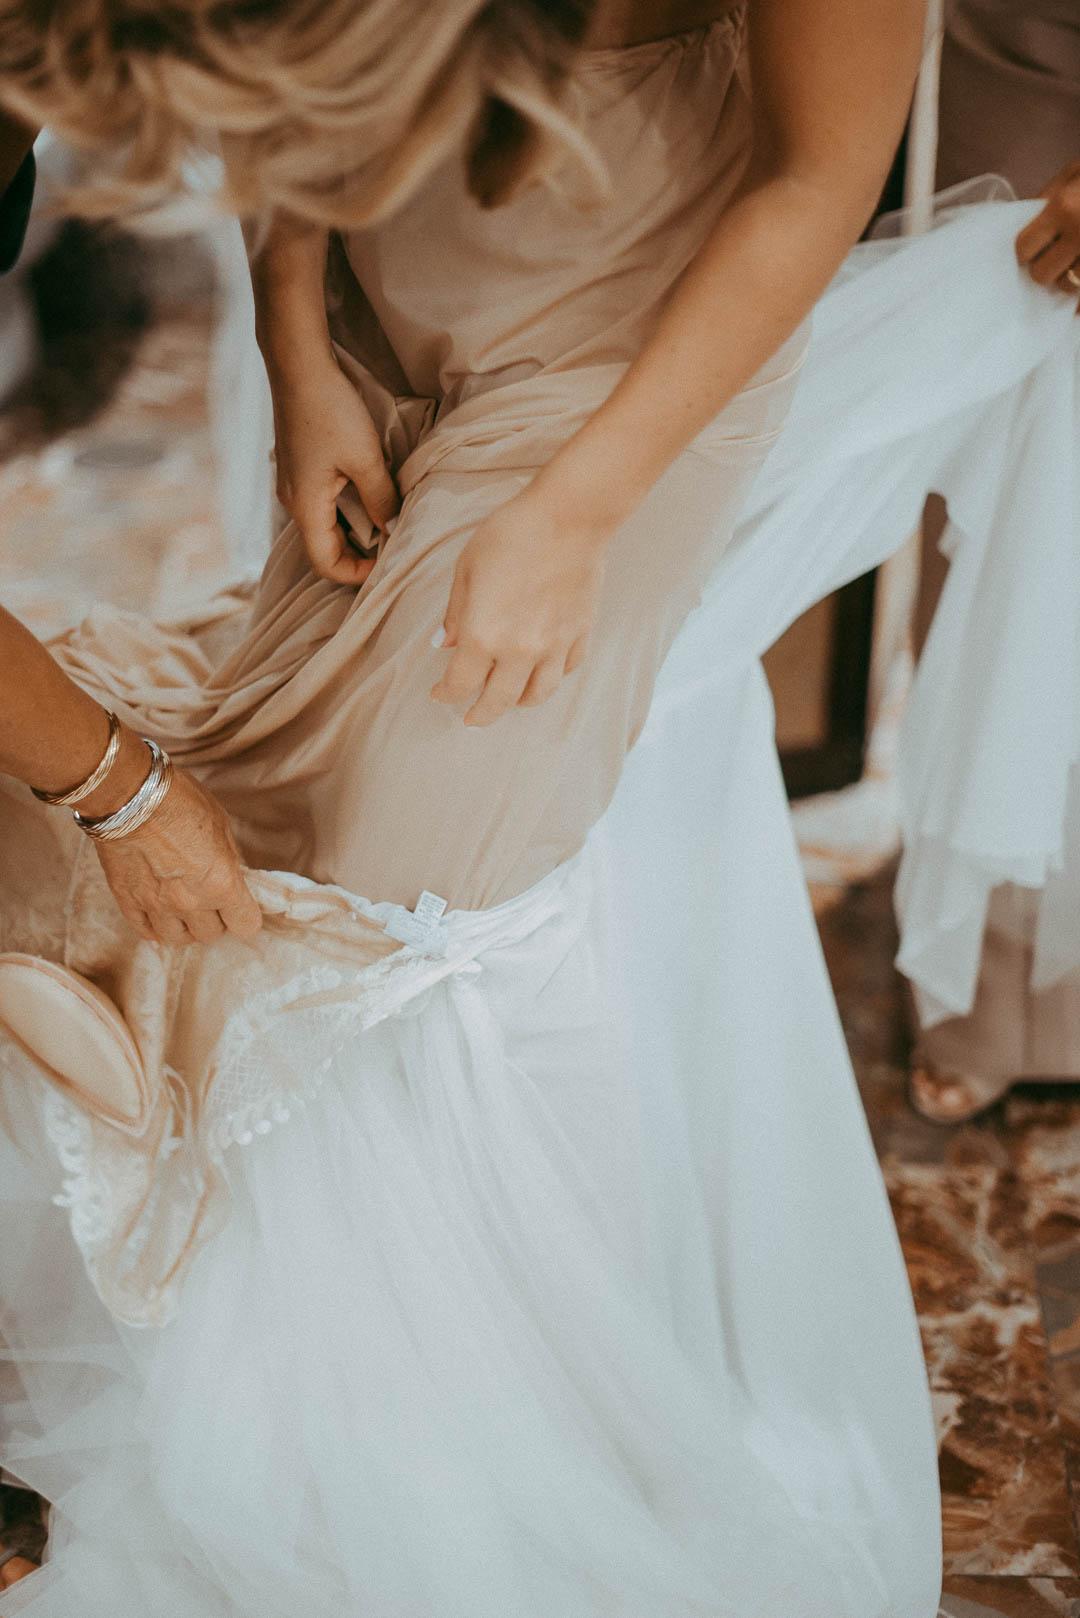 vivianeizzo-spazio46-wedding-photographer-destination-reportage-napoli-villacilento-22